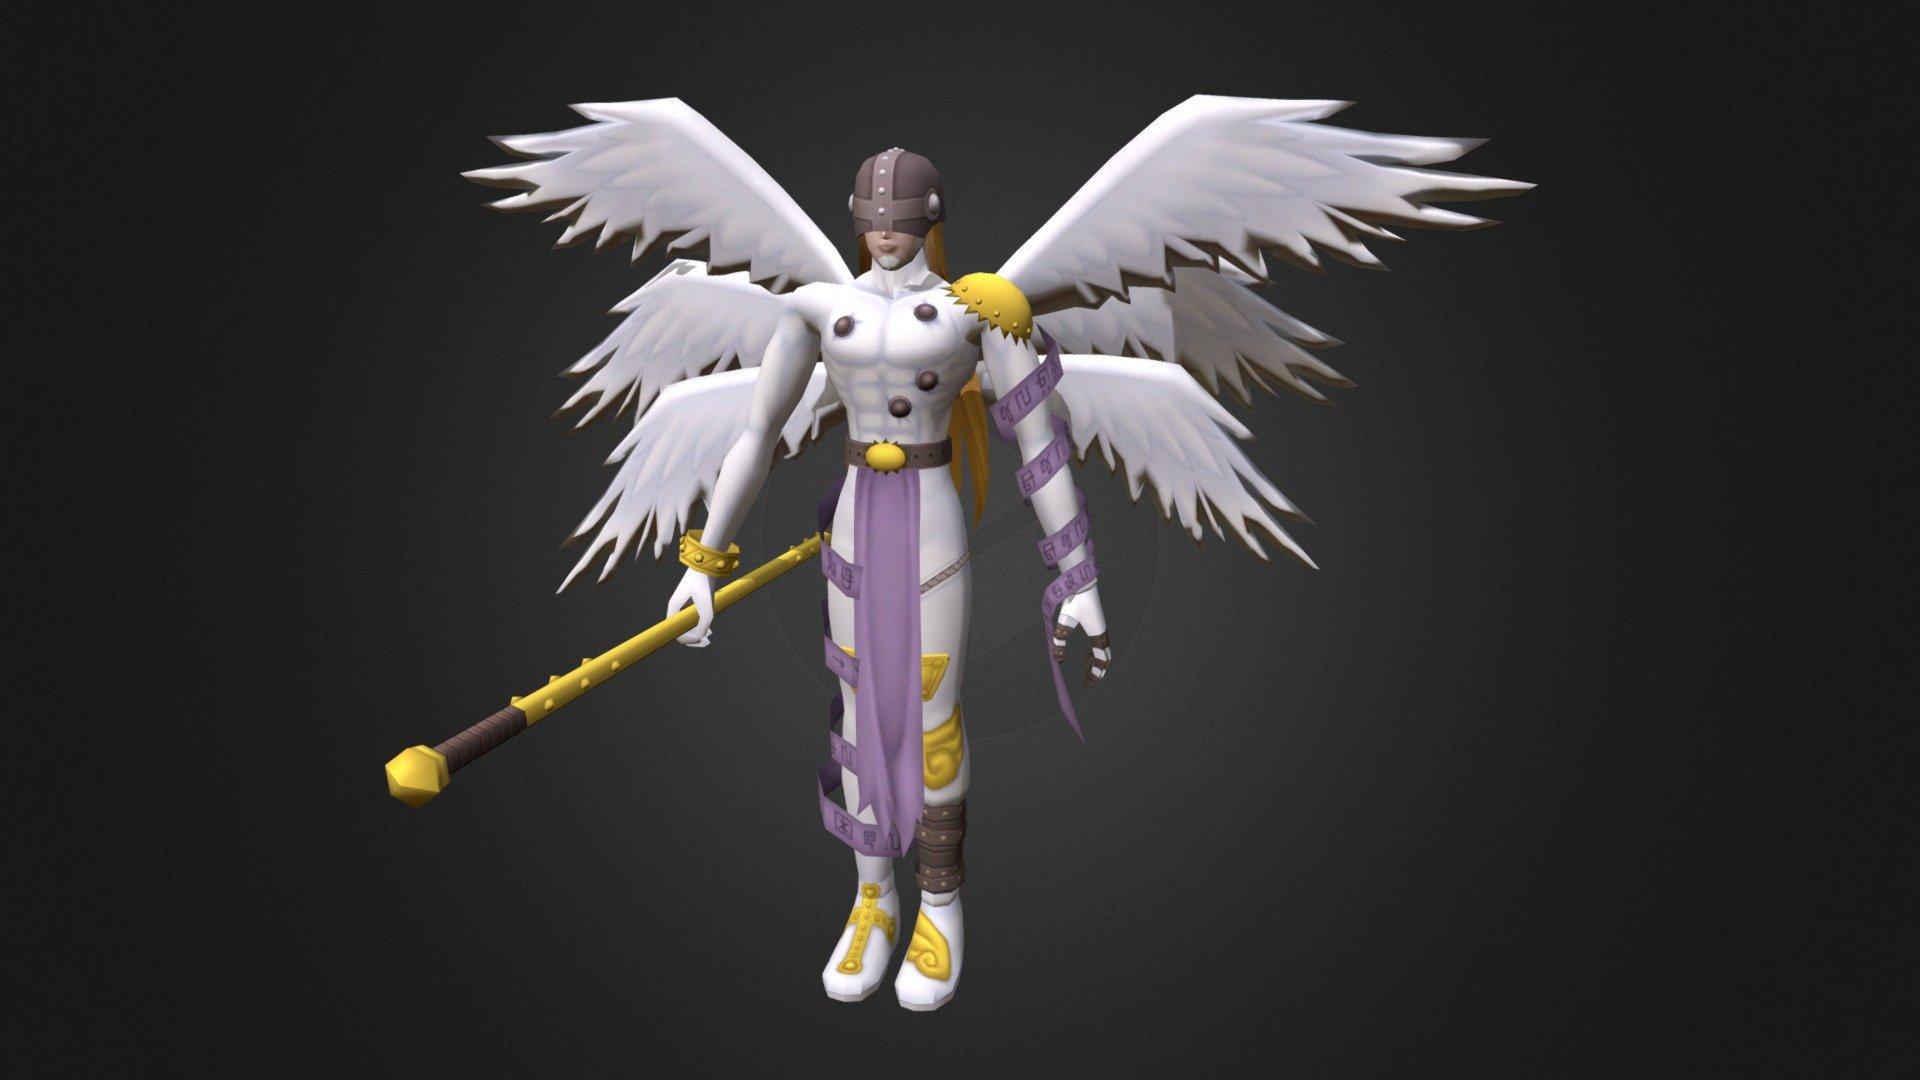 Digimon 3d Angemon Angemon 3d Model 1716194 Hd